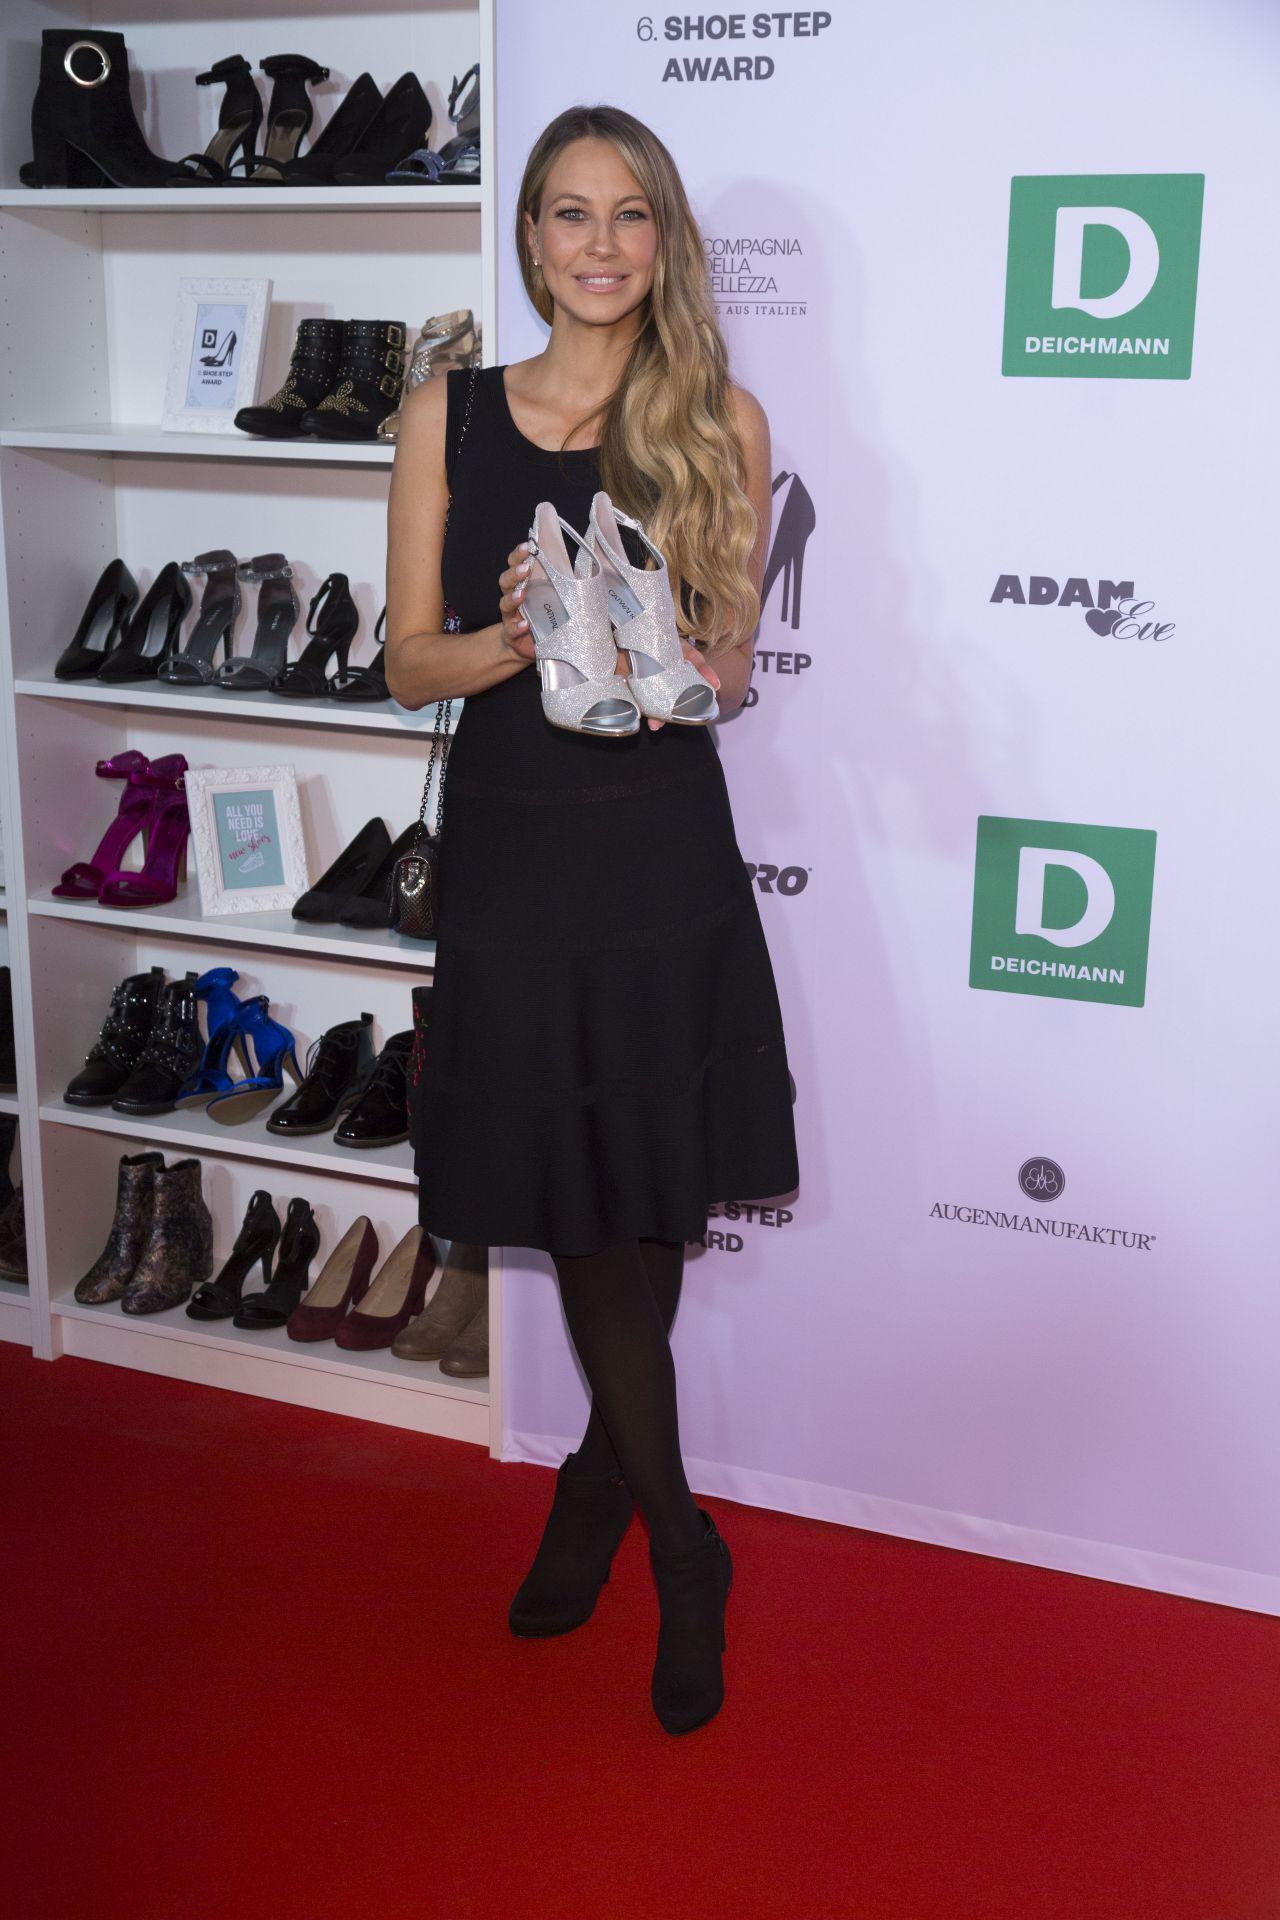 Alessandra Meyer-Wölden – Deichmann Shoe Step Award in Hamburg 05/16/2017